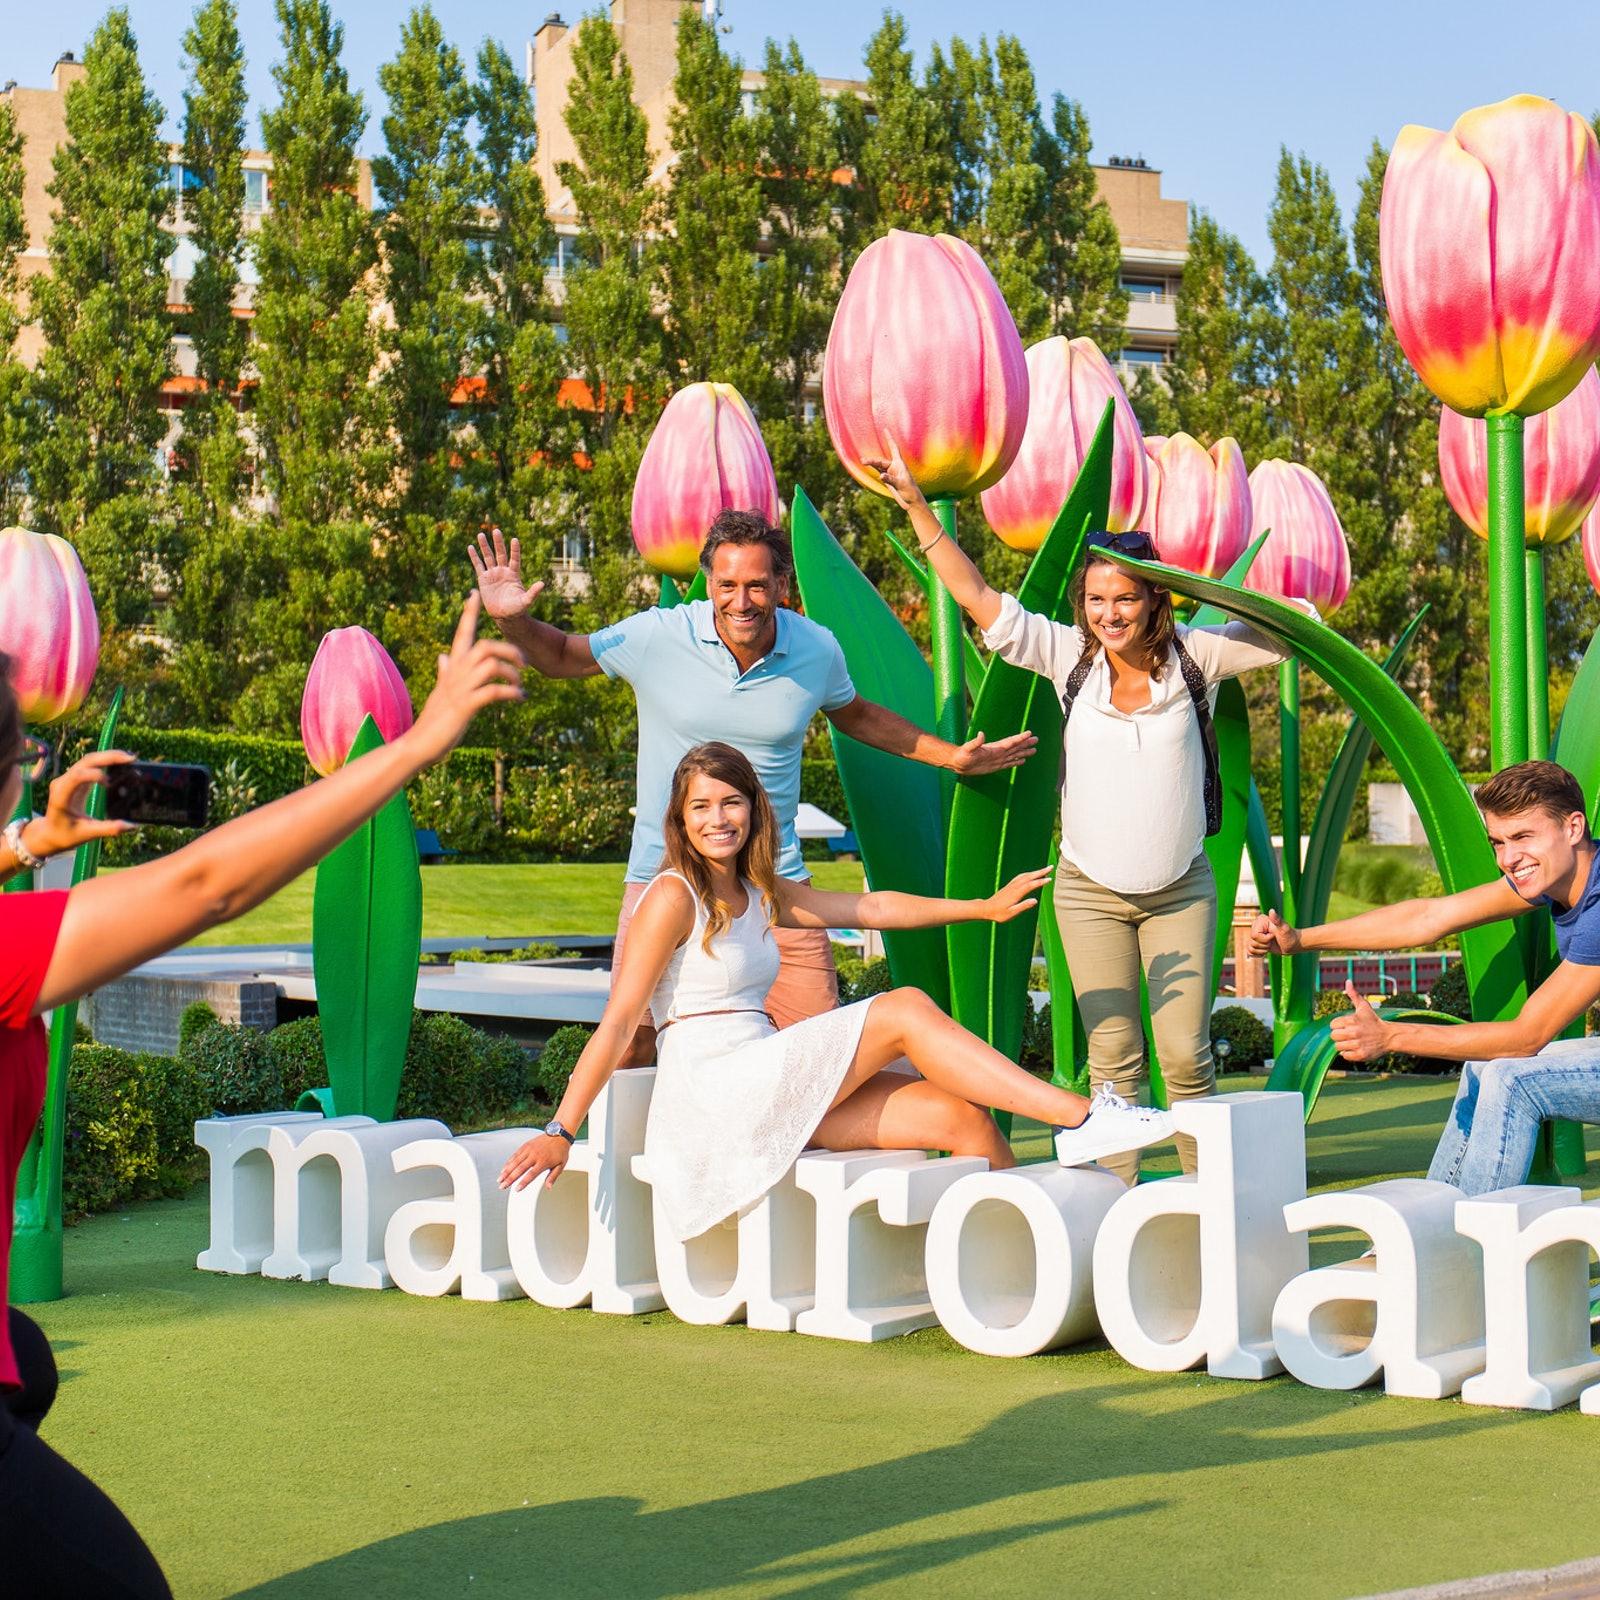 Holland Heute Geöffnet